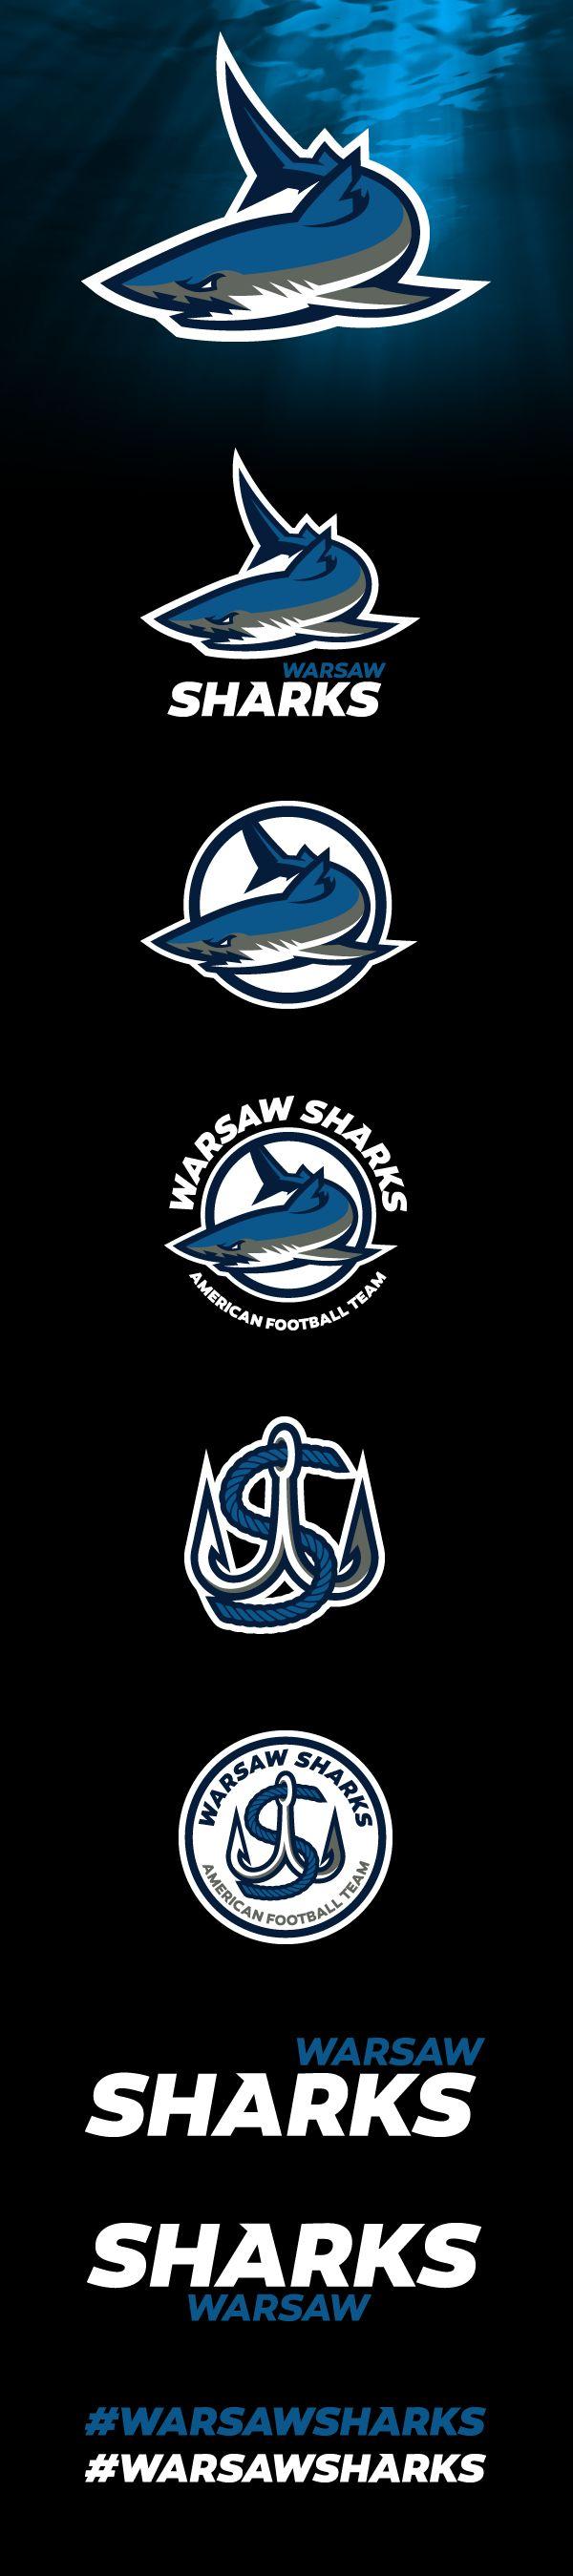 Warsaw Sharks - Sports Branding